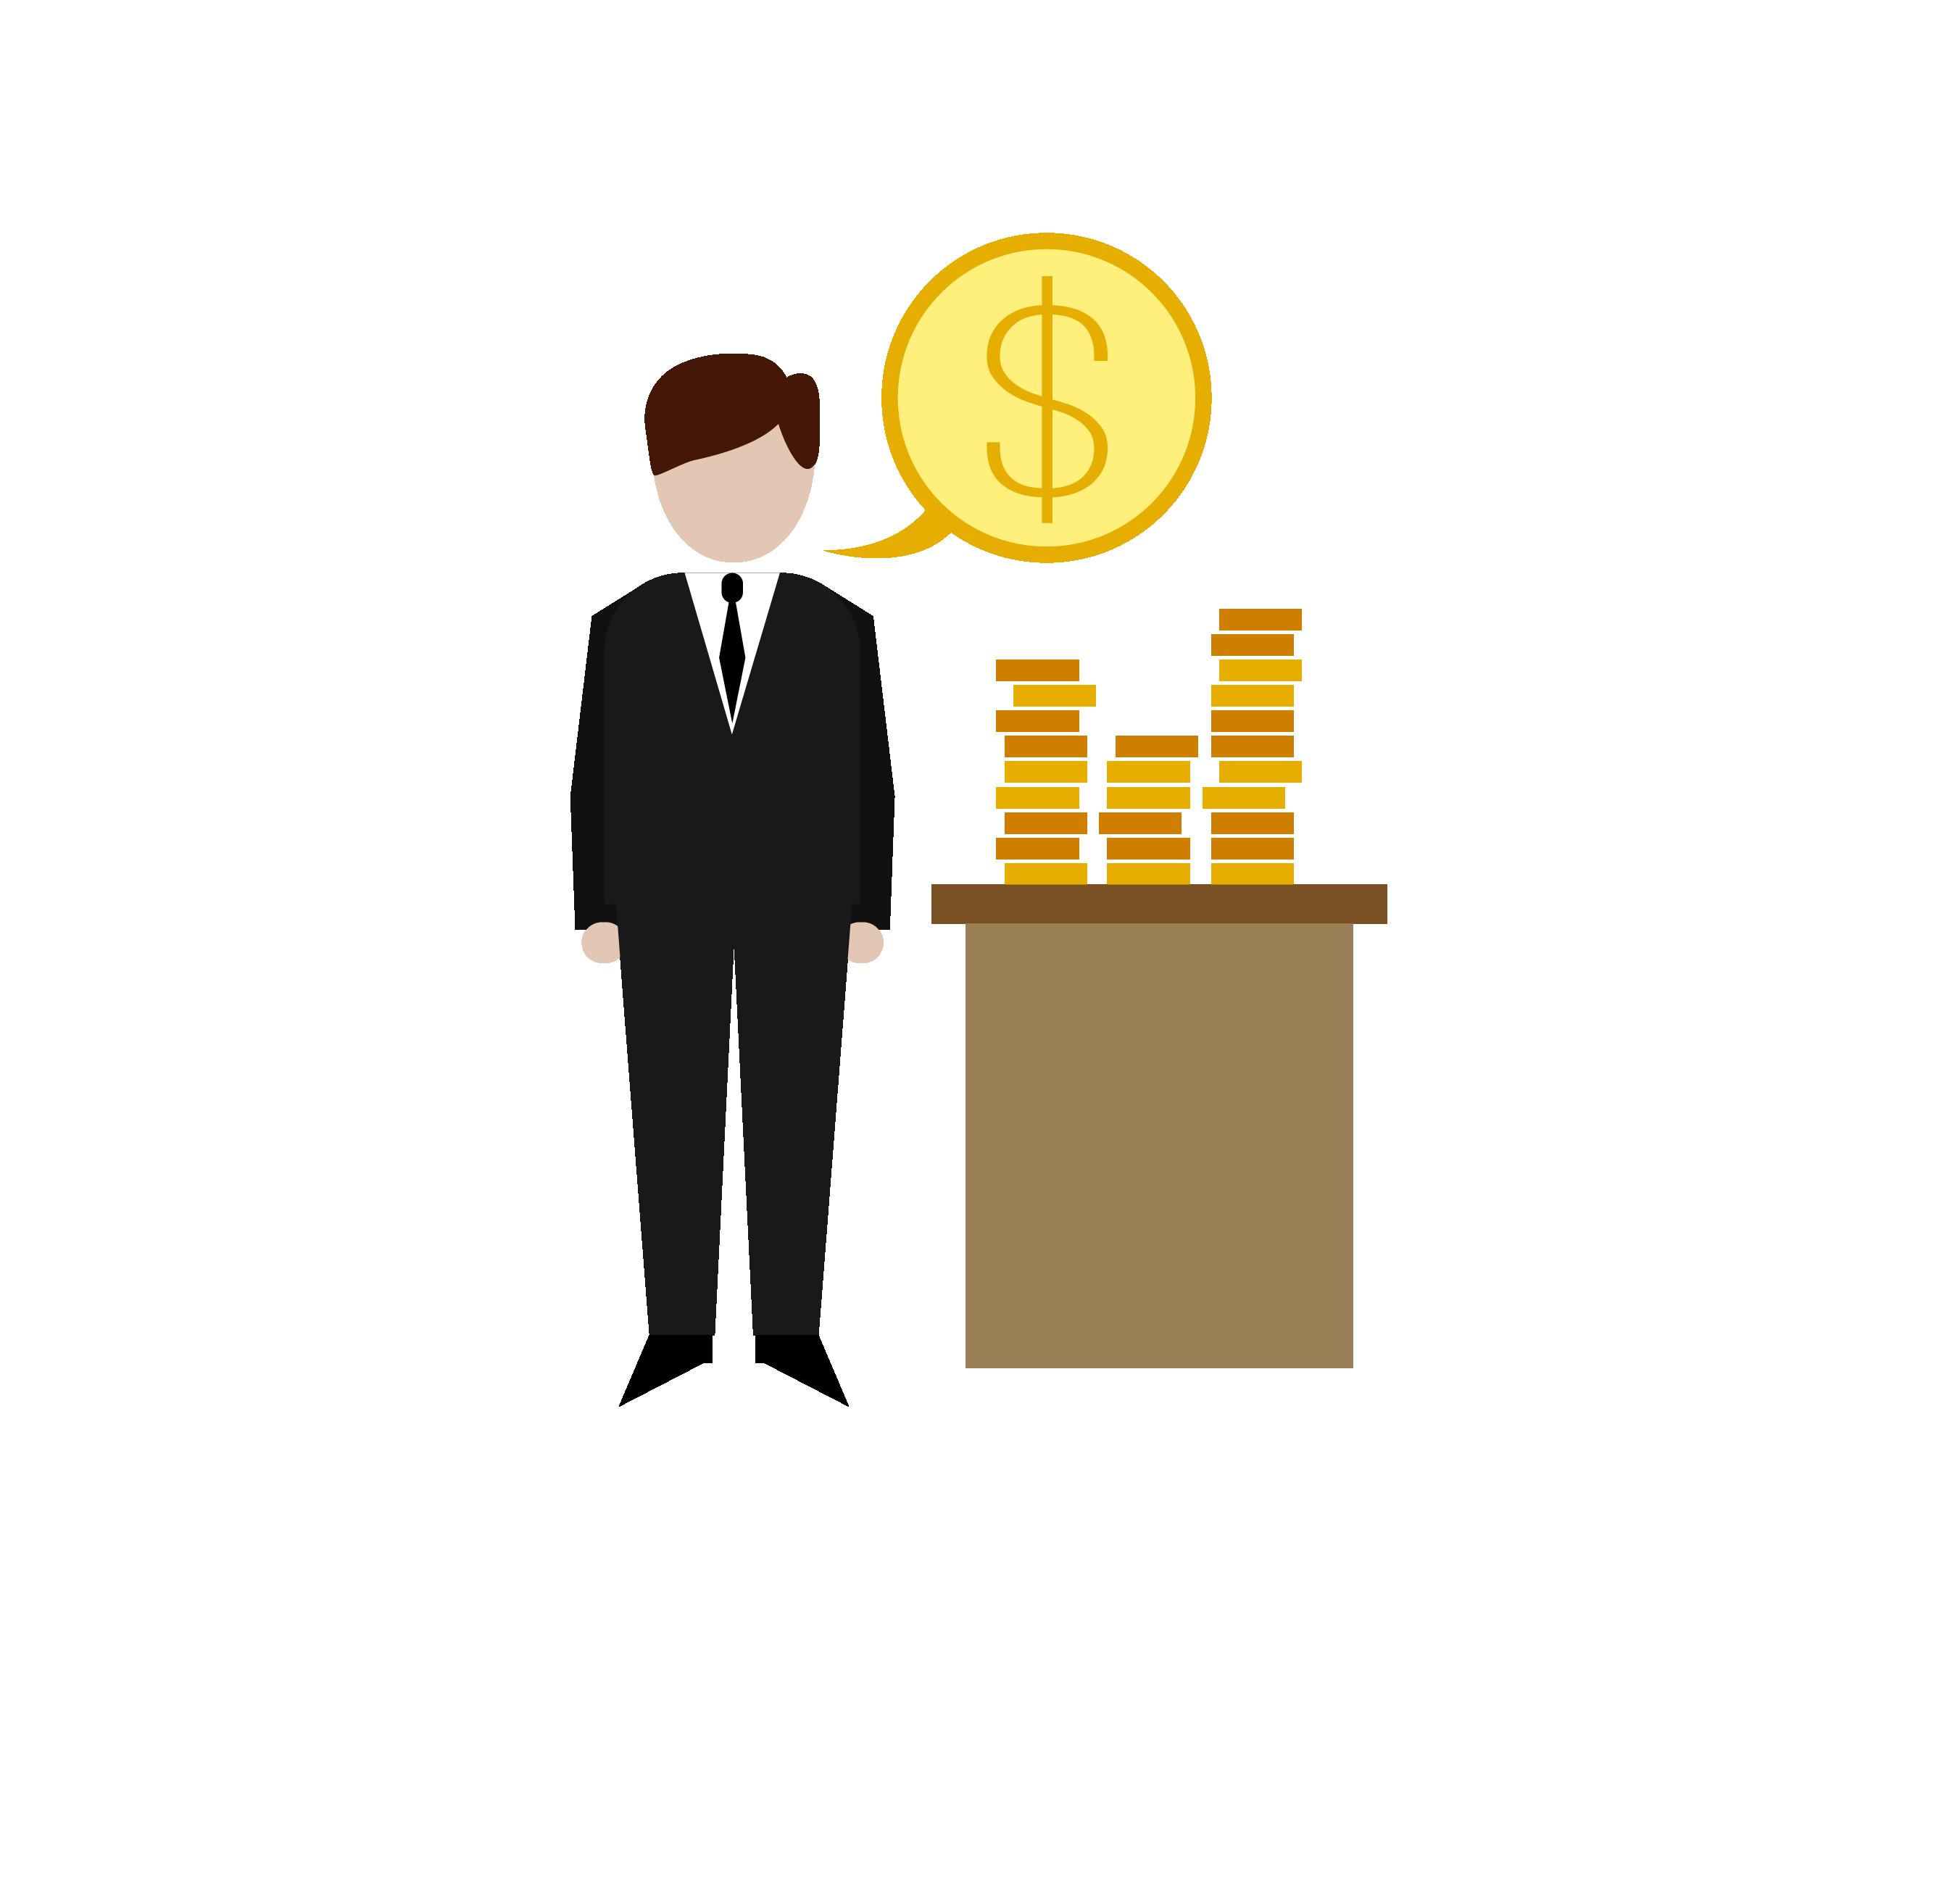 Pernah Bangkrut Trading Forex? Jangan Menyerah, OTA Trading Solusinya | Central Capital Futures